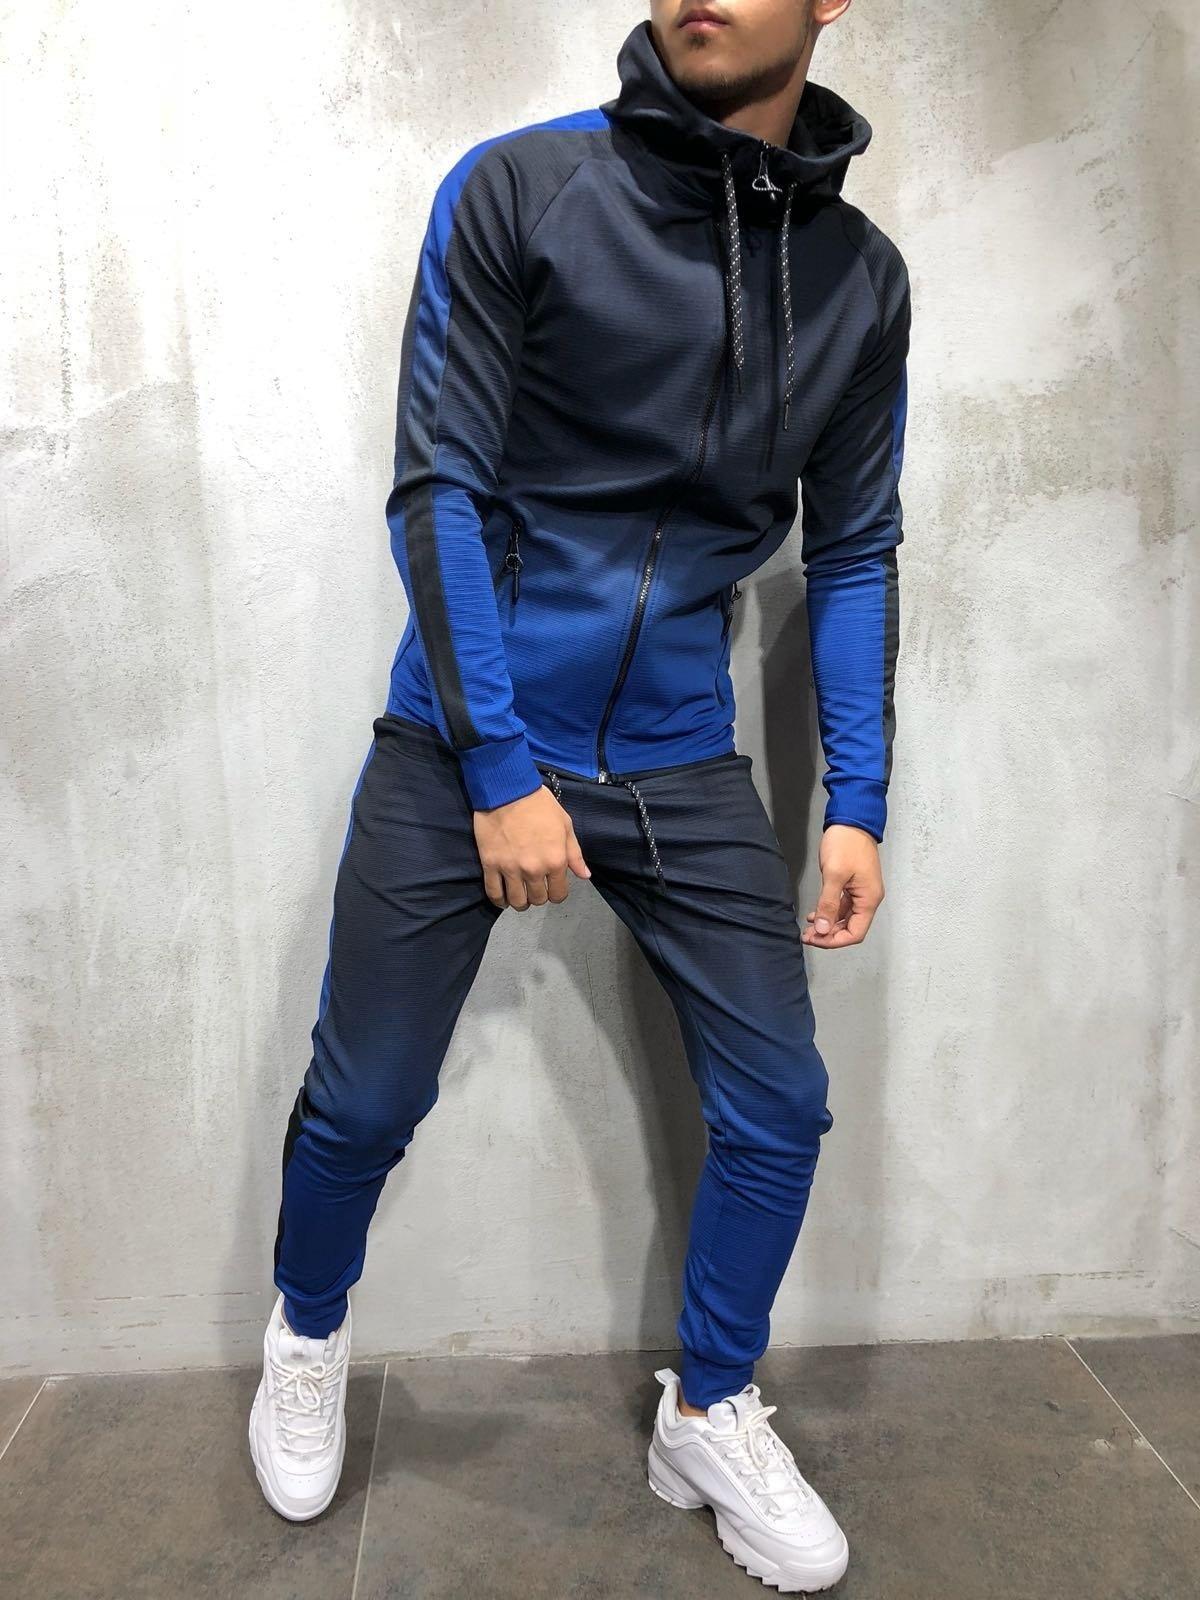 Zogaa 2018 Spring Set Men's Fashion Sportswear Tracksuits Sets Men's Bodybuilding Hoodies+Pants casual Outwear Suits S XXXL